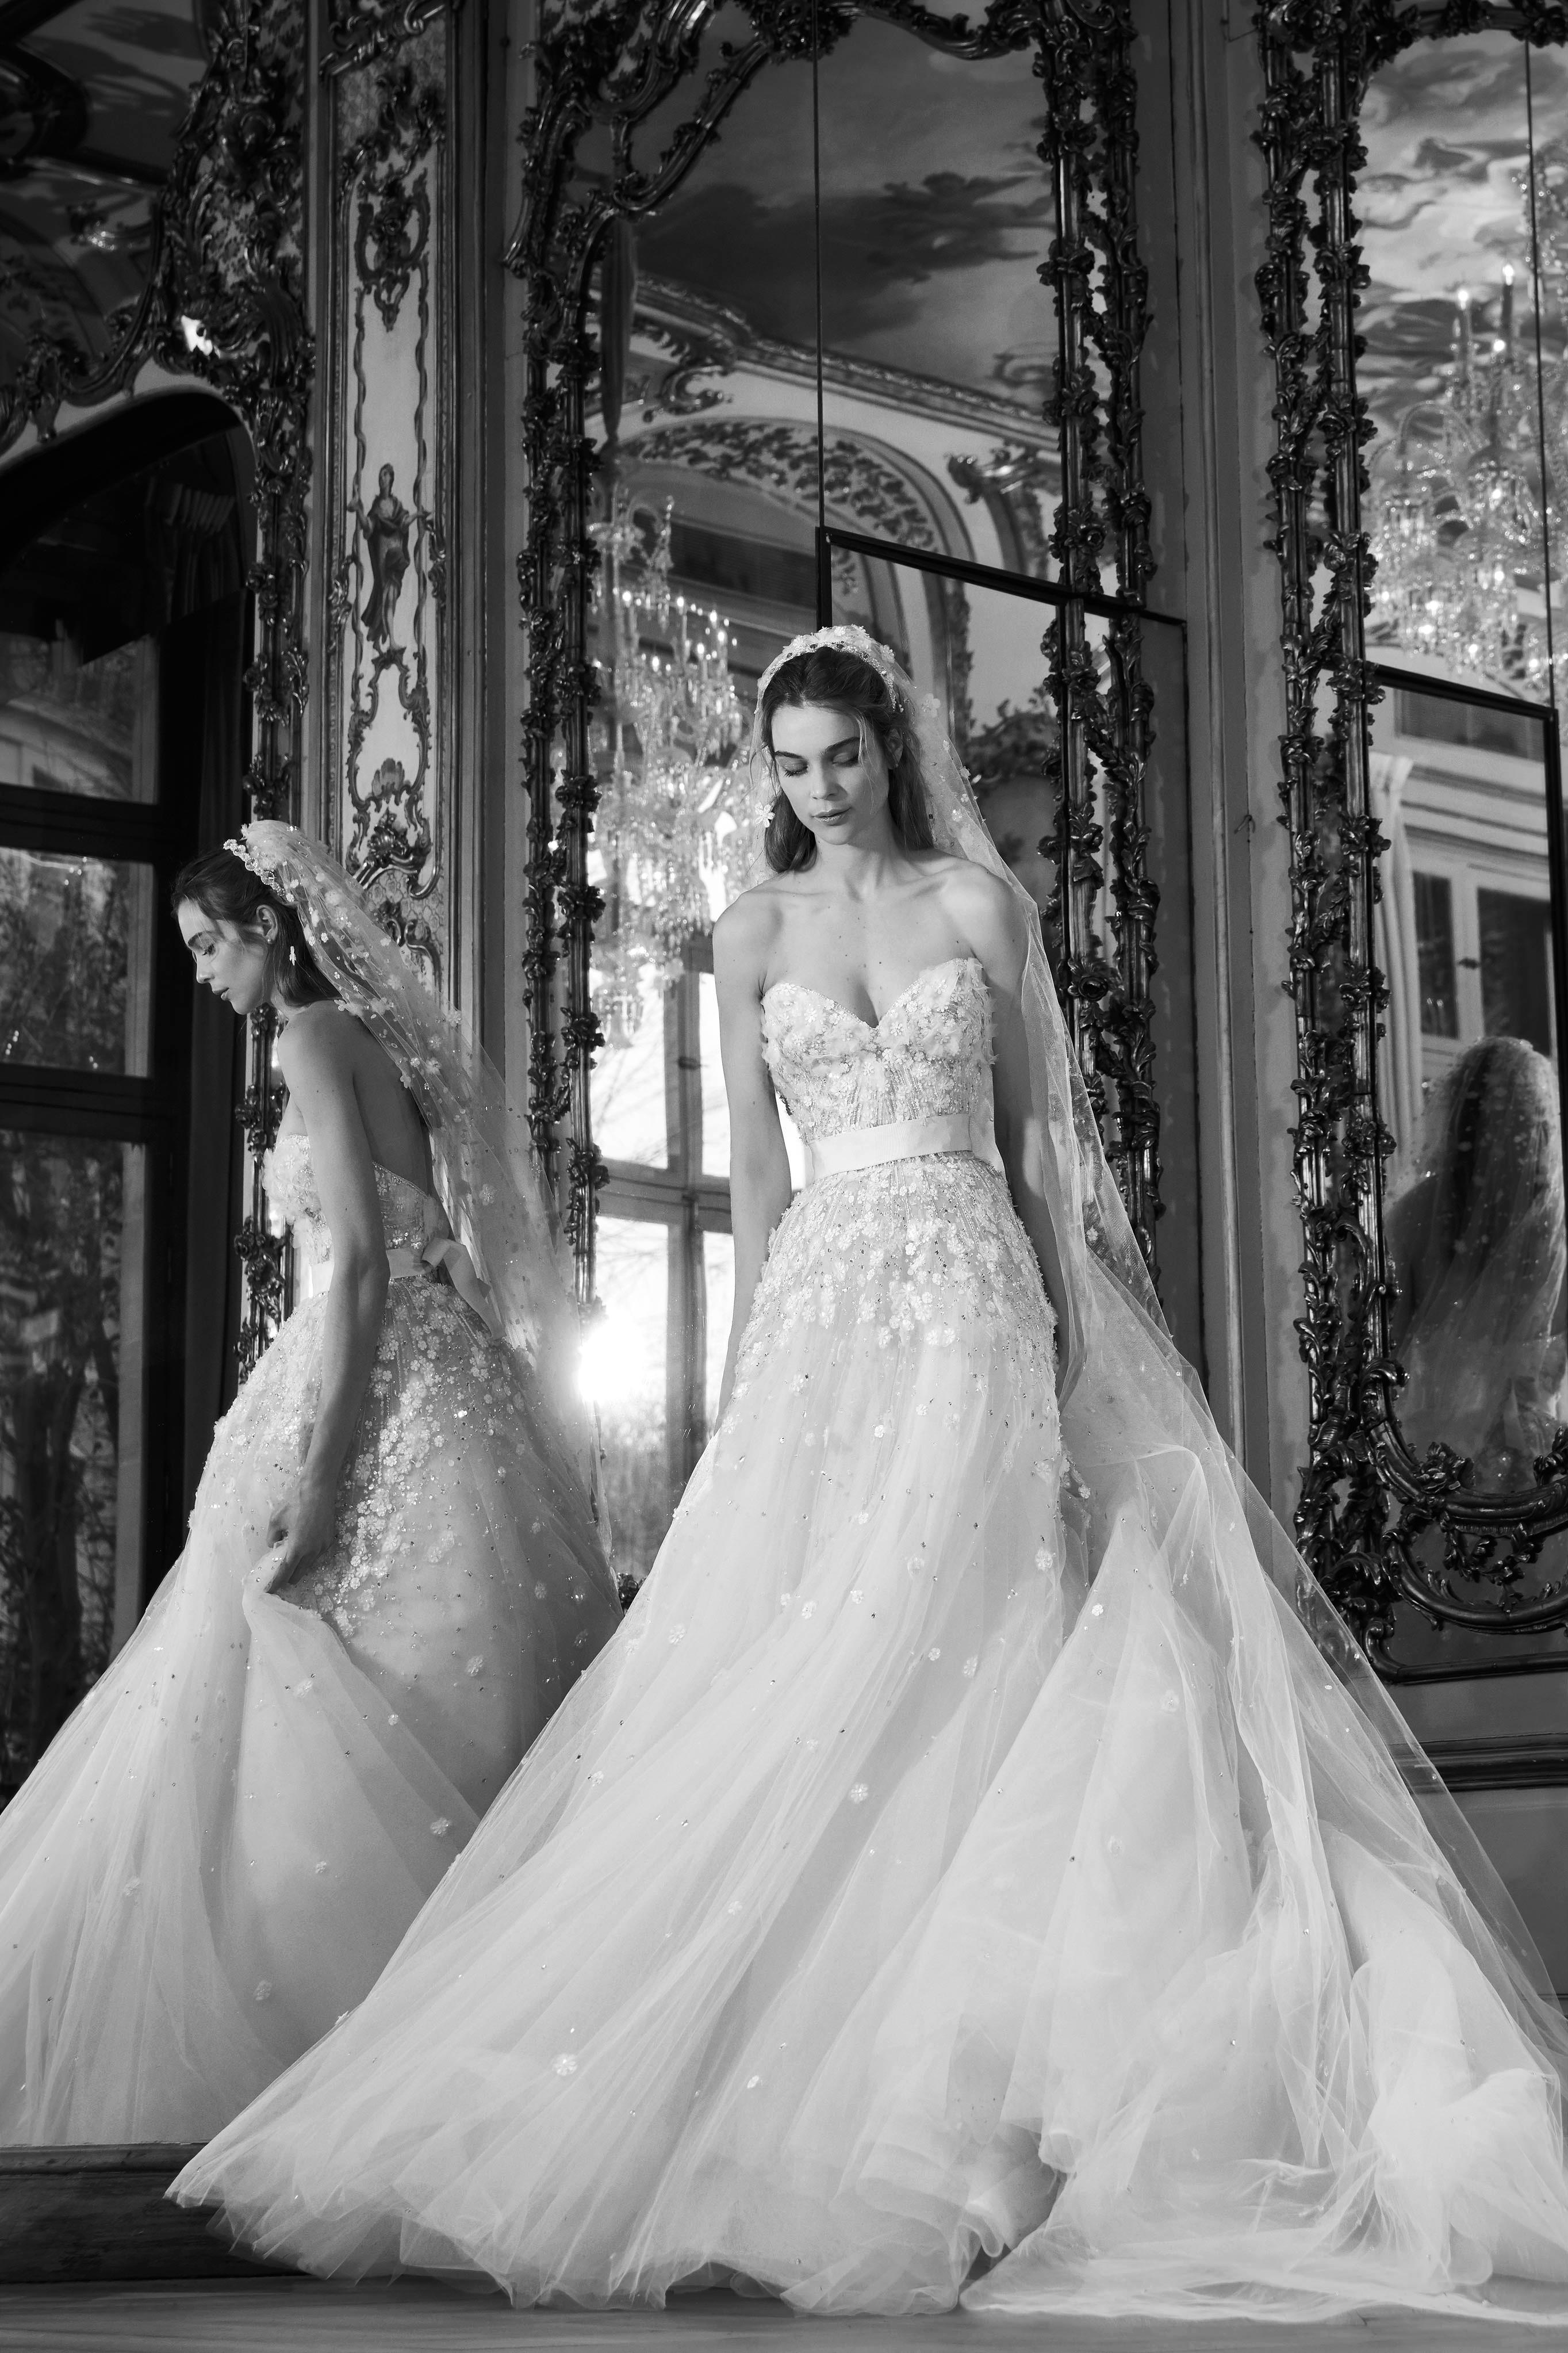 elie saab wedding dress spring 2019 strapless tulle a-line